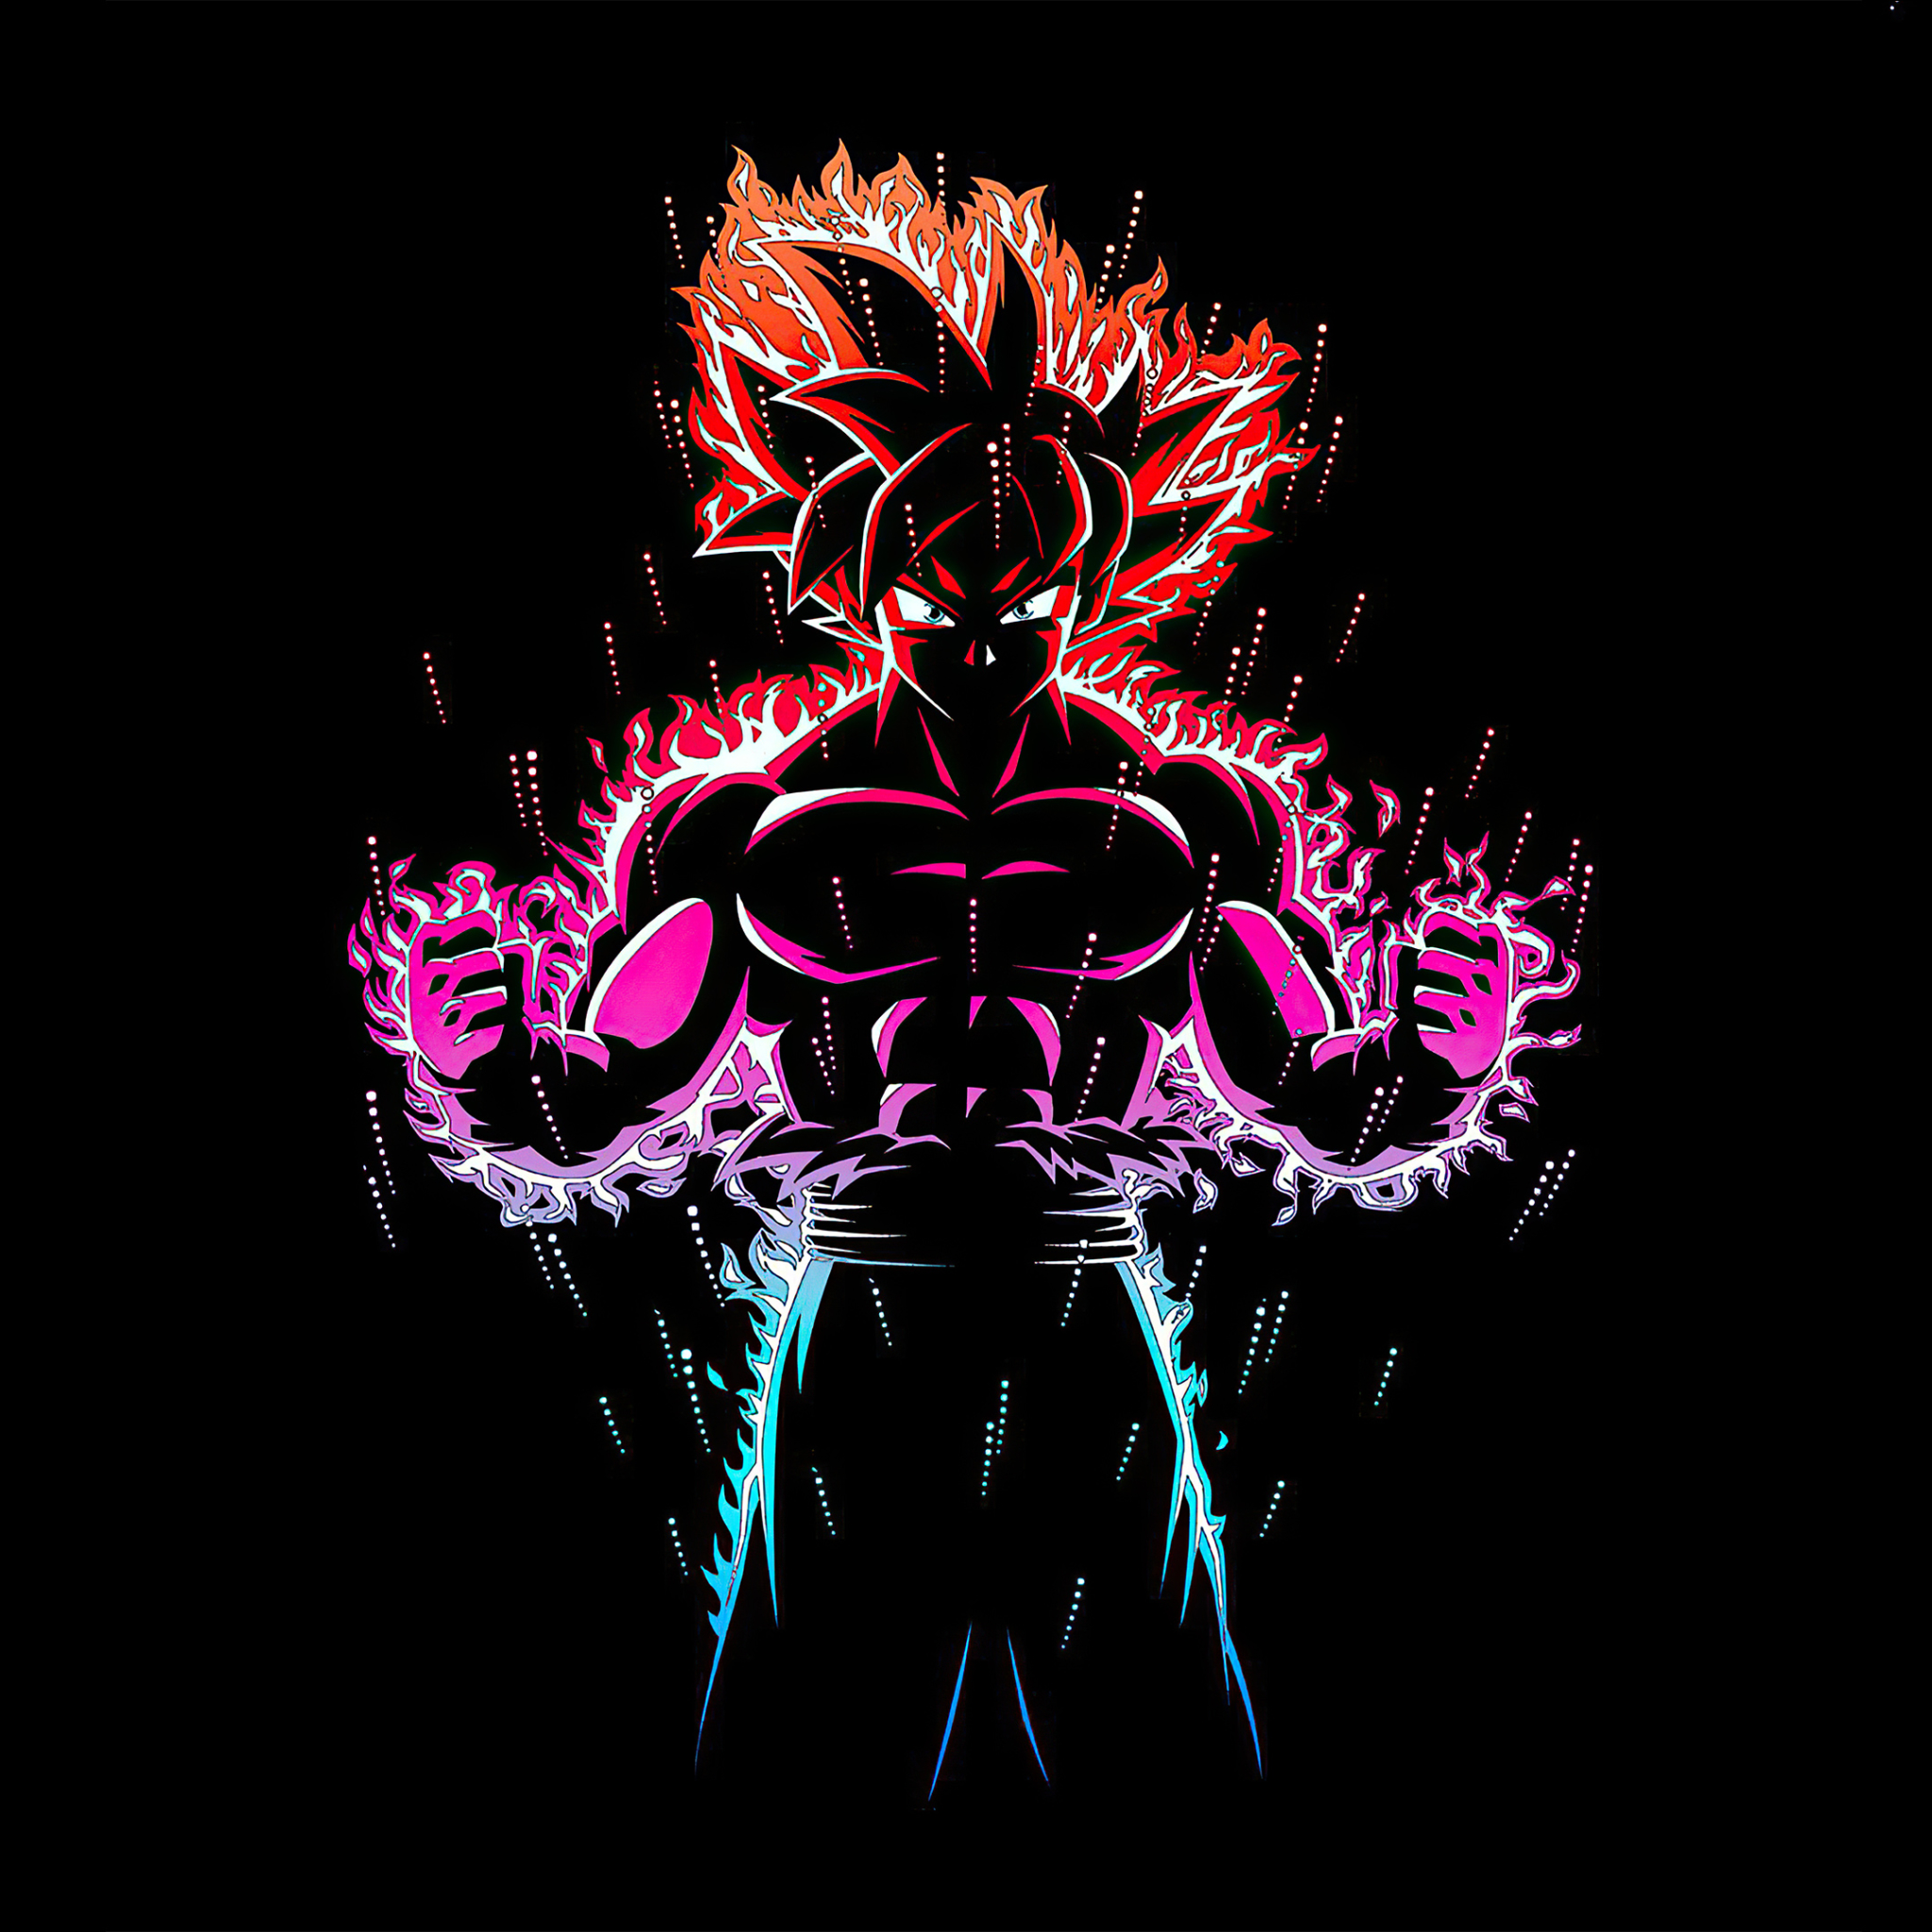 2048x2048 Dragon Ball Z Goku Ultra Instinct Fire Ipad Air Wallpaper, HD Anime 4K Wallpapers ...